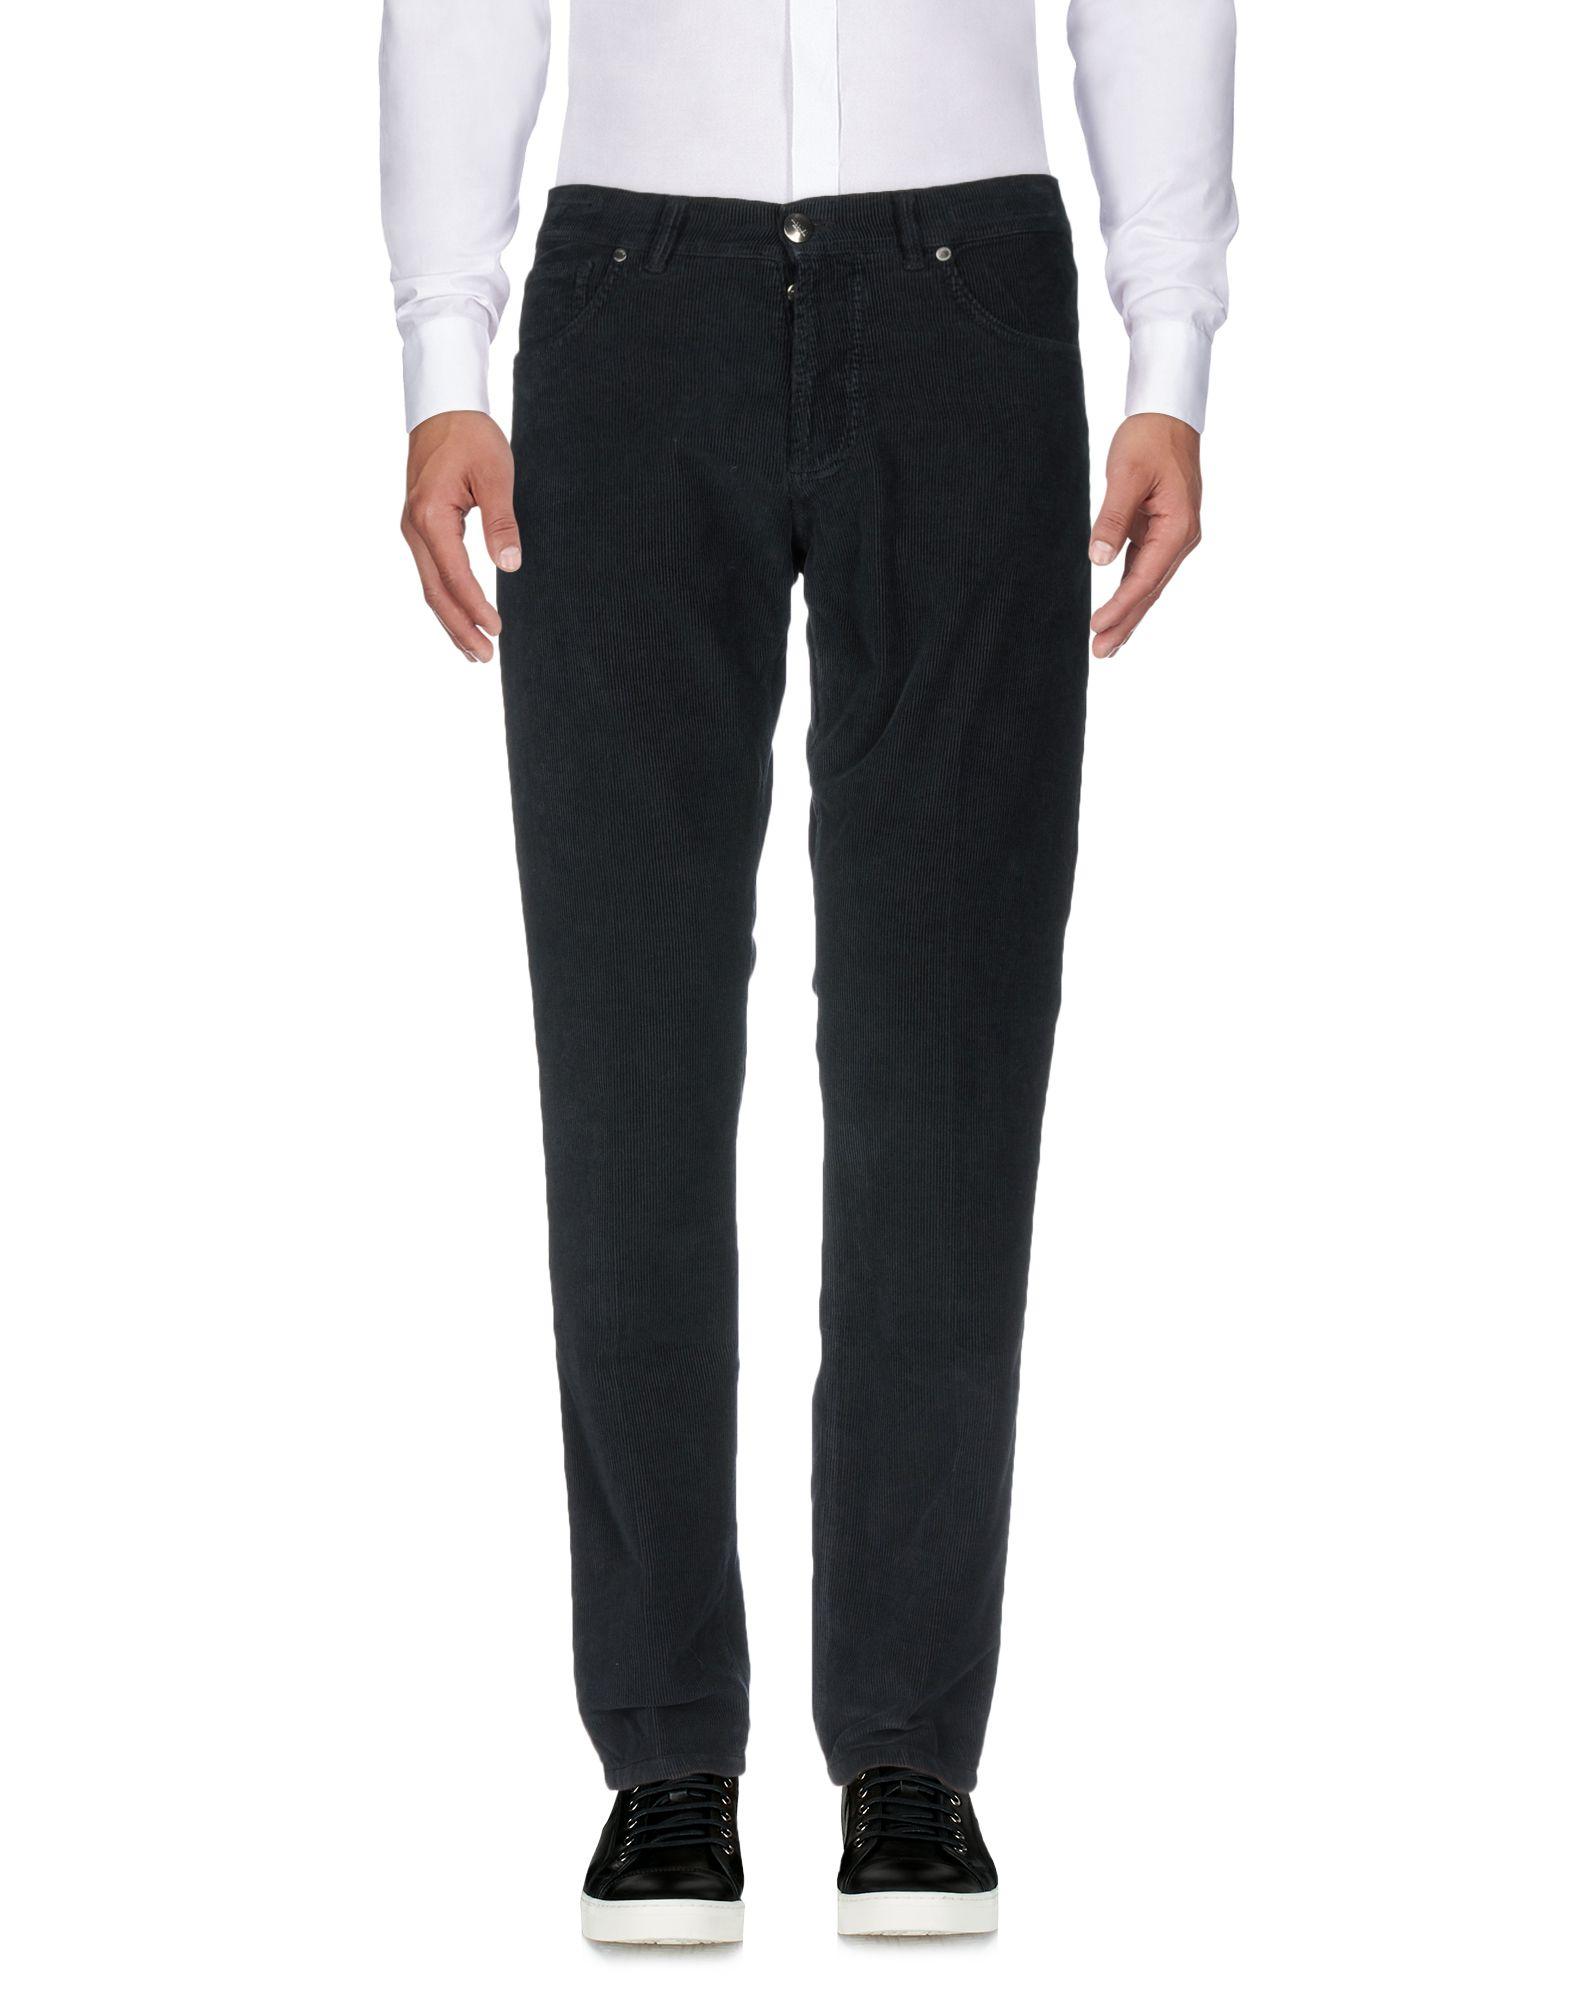 Pantalone Moorer Donna - Acquista online su